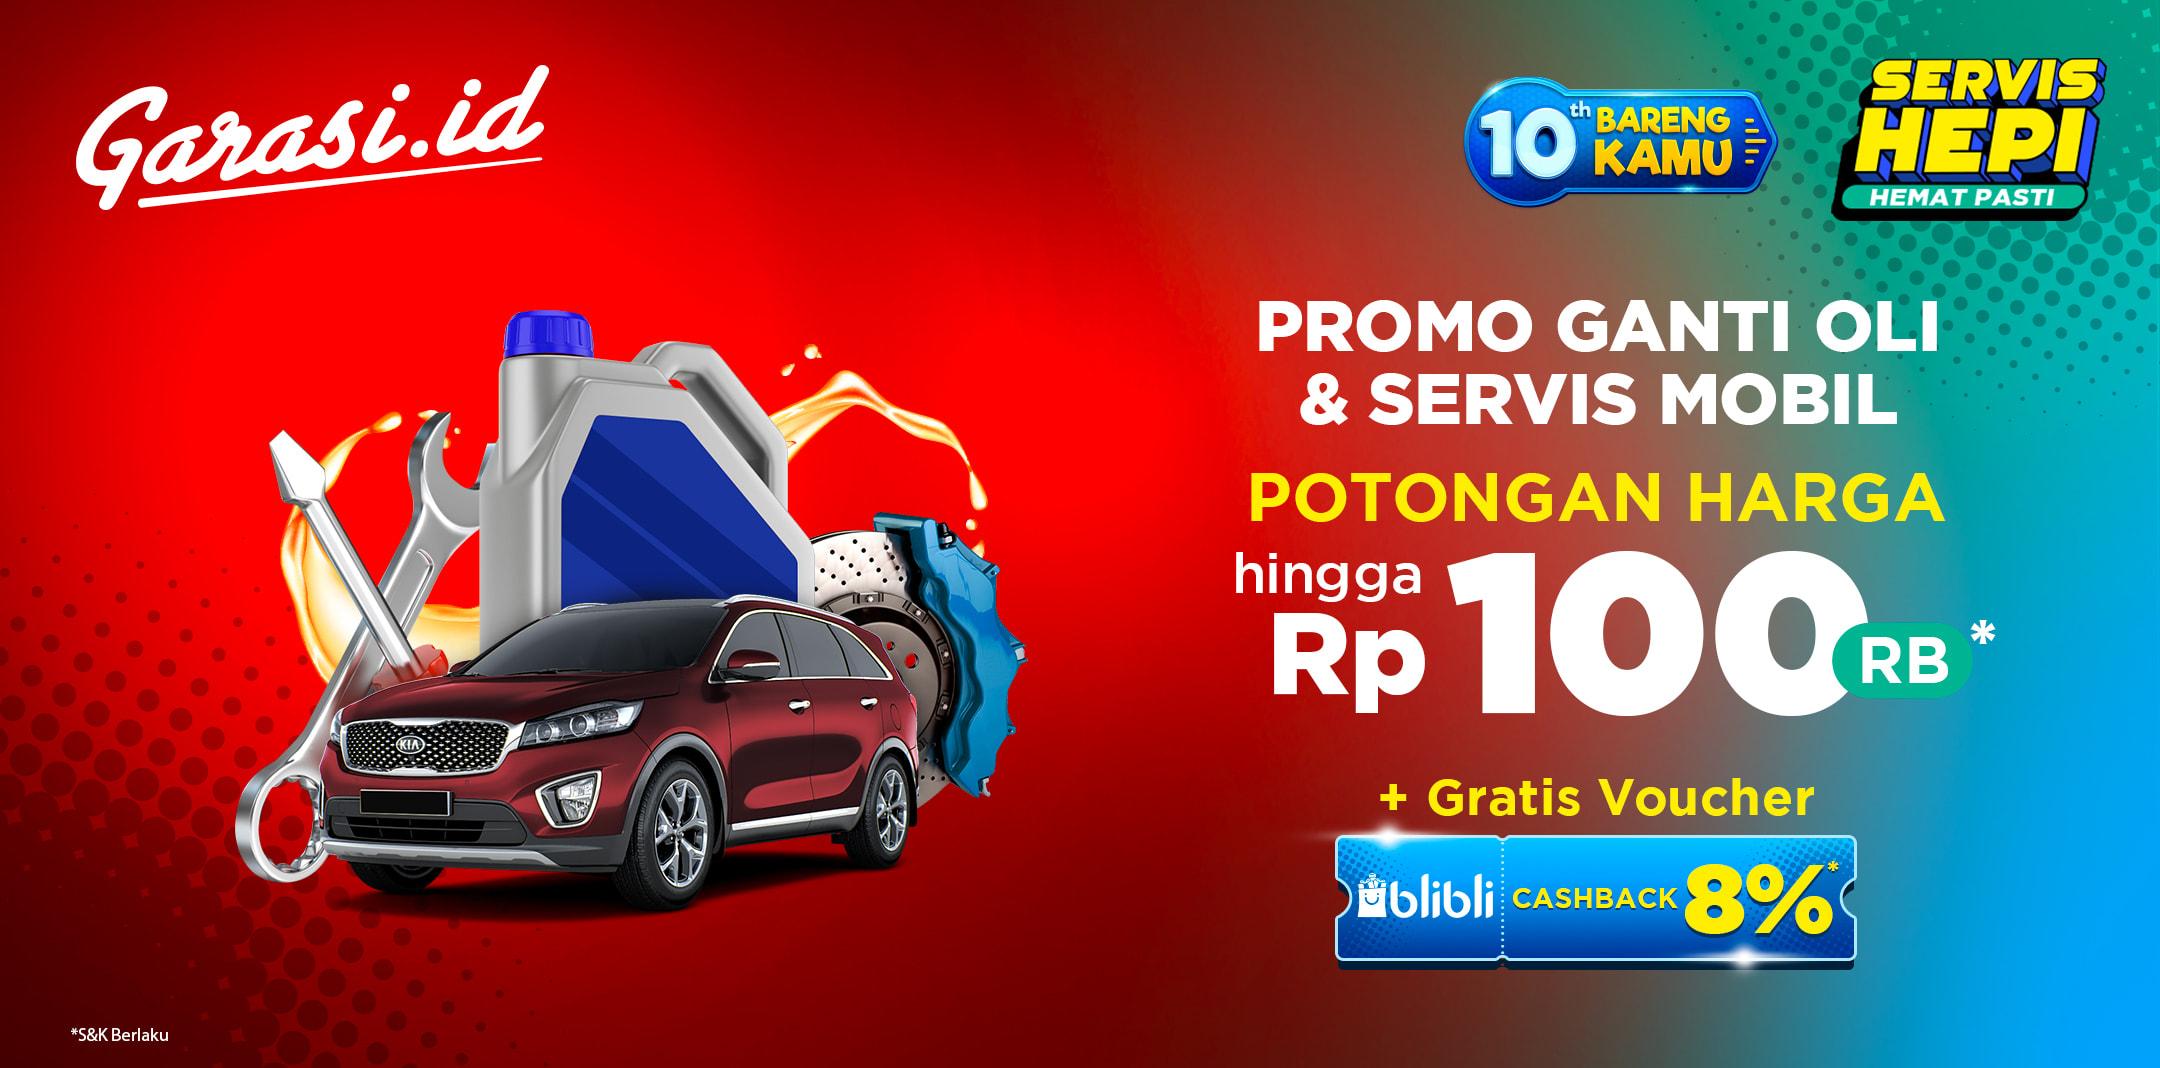 Dapatkan Diskon hingga Rp 100 ribu + GRATIS Voucher Cashback 8% di Blibli, untuk jasa Ganti Oli dan Servis Mobil di Jasa dan Servis Garasi.id!